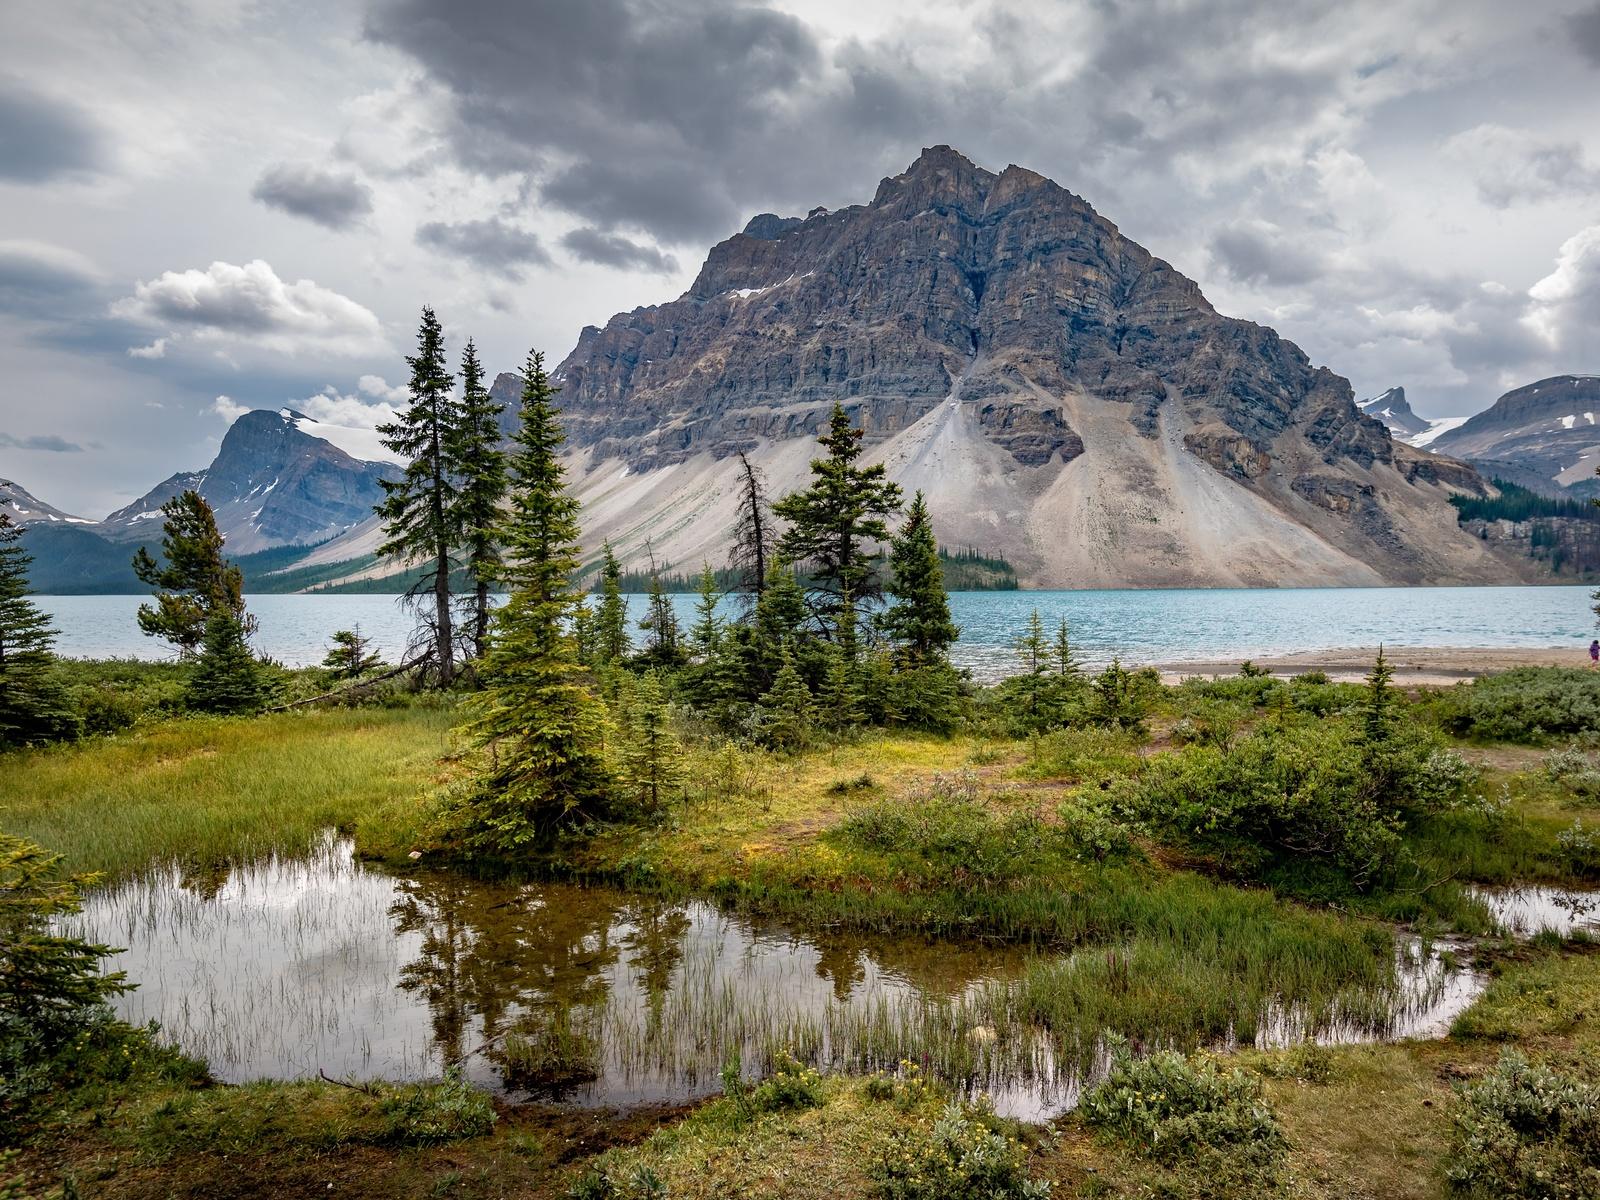 горы, озеро, канада, пейзаж, bow lake, alberta, деревья, облака, банф, природа